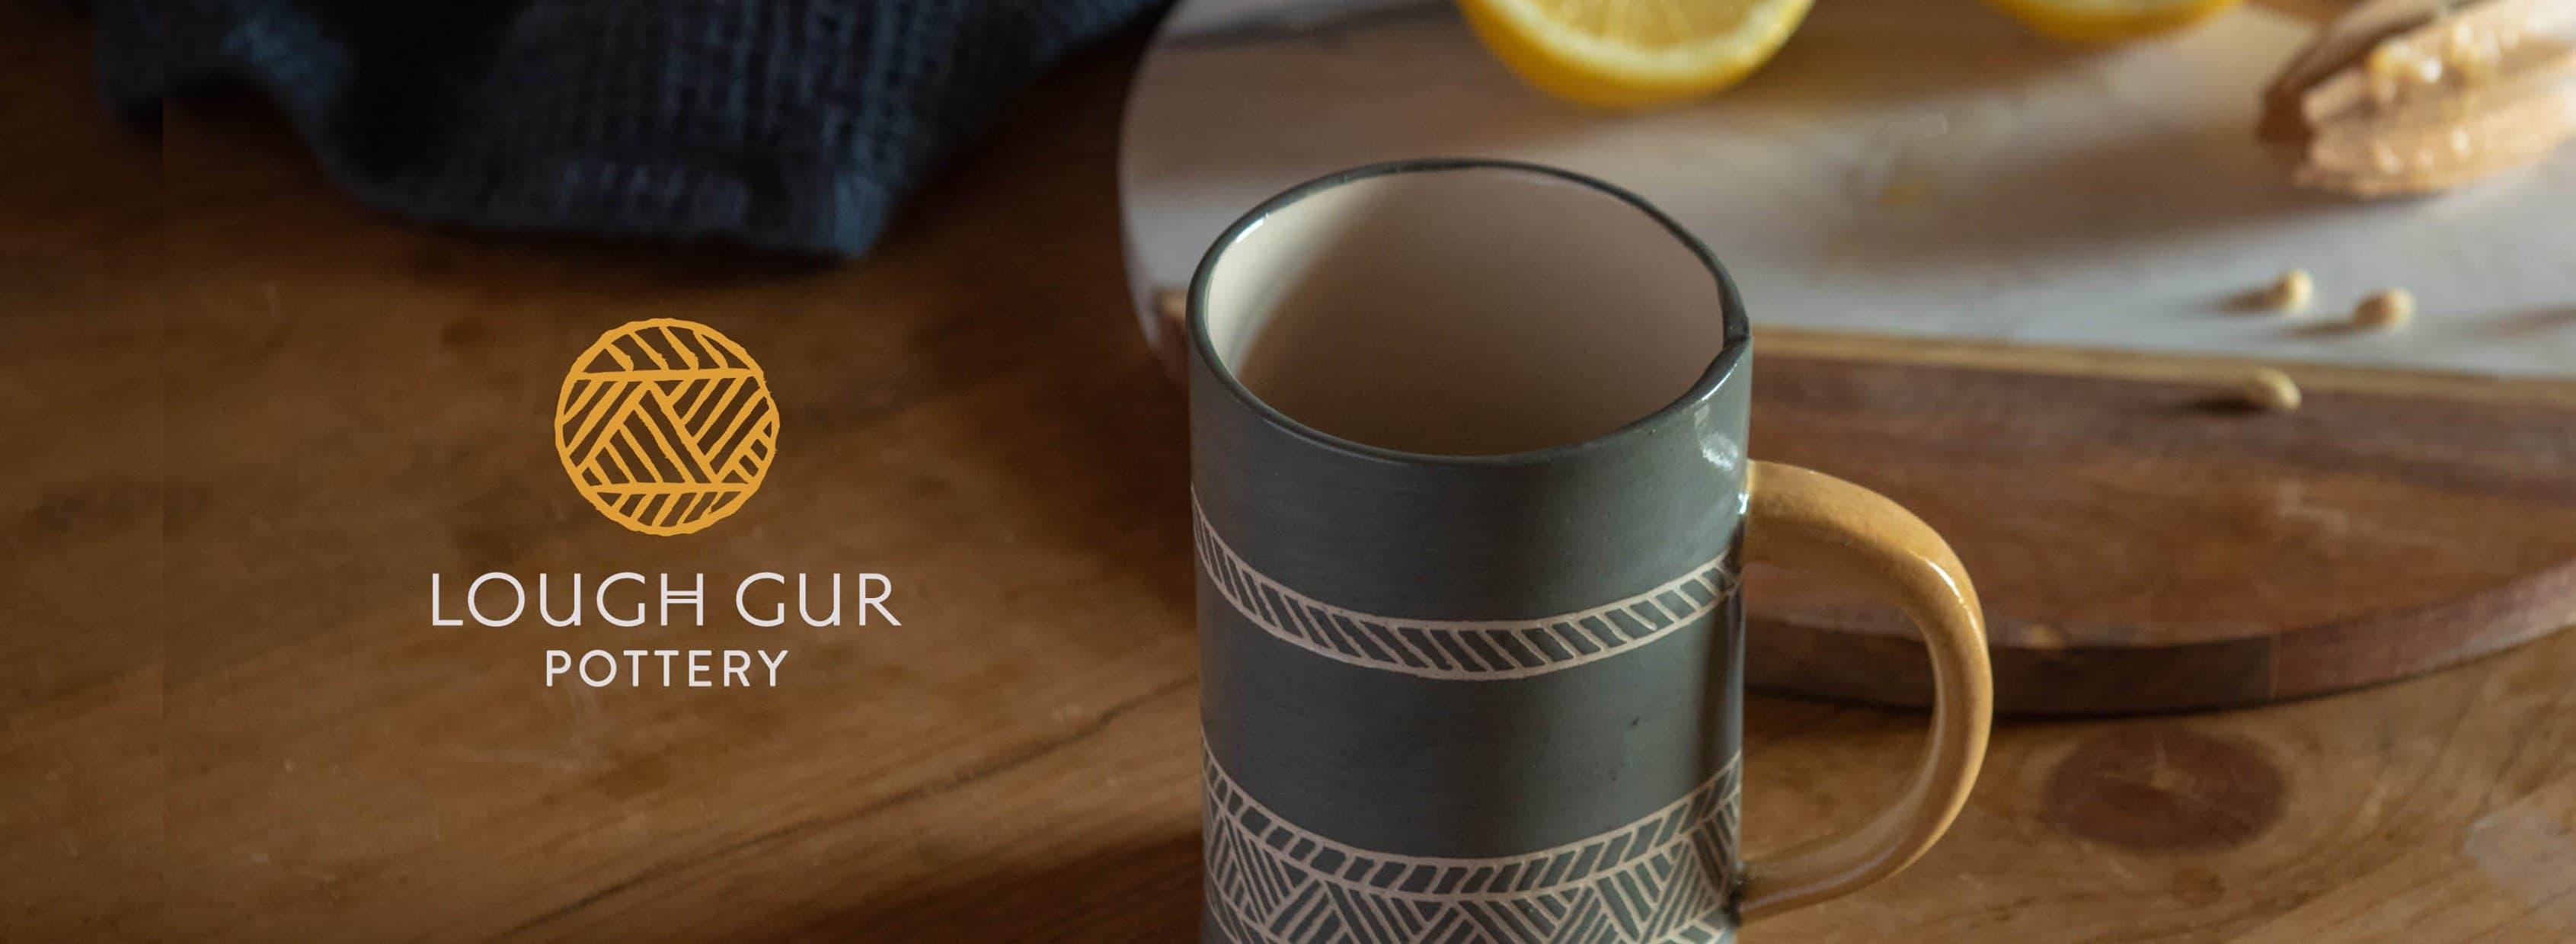 Lough gur pottery 2